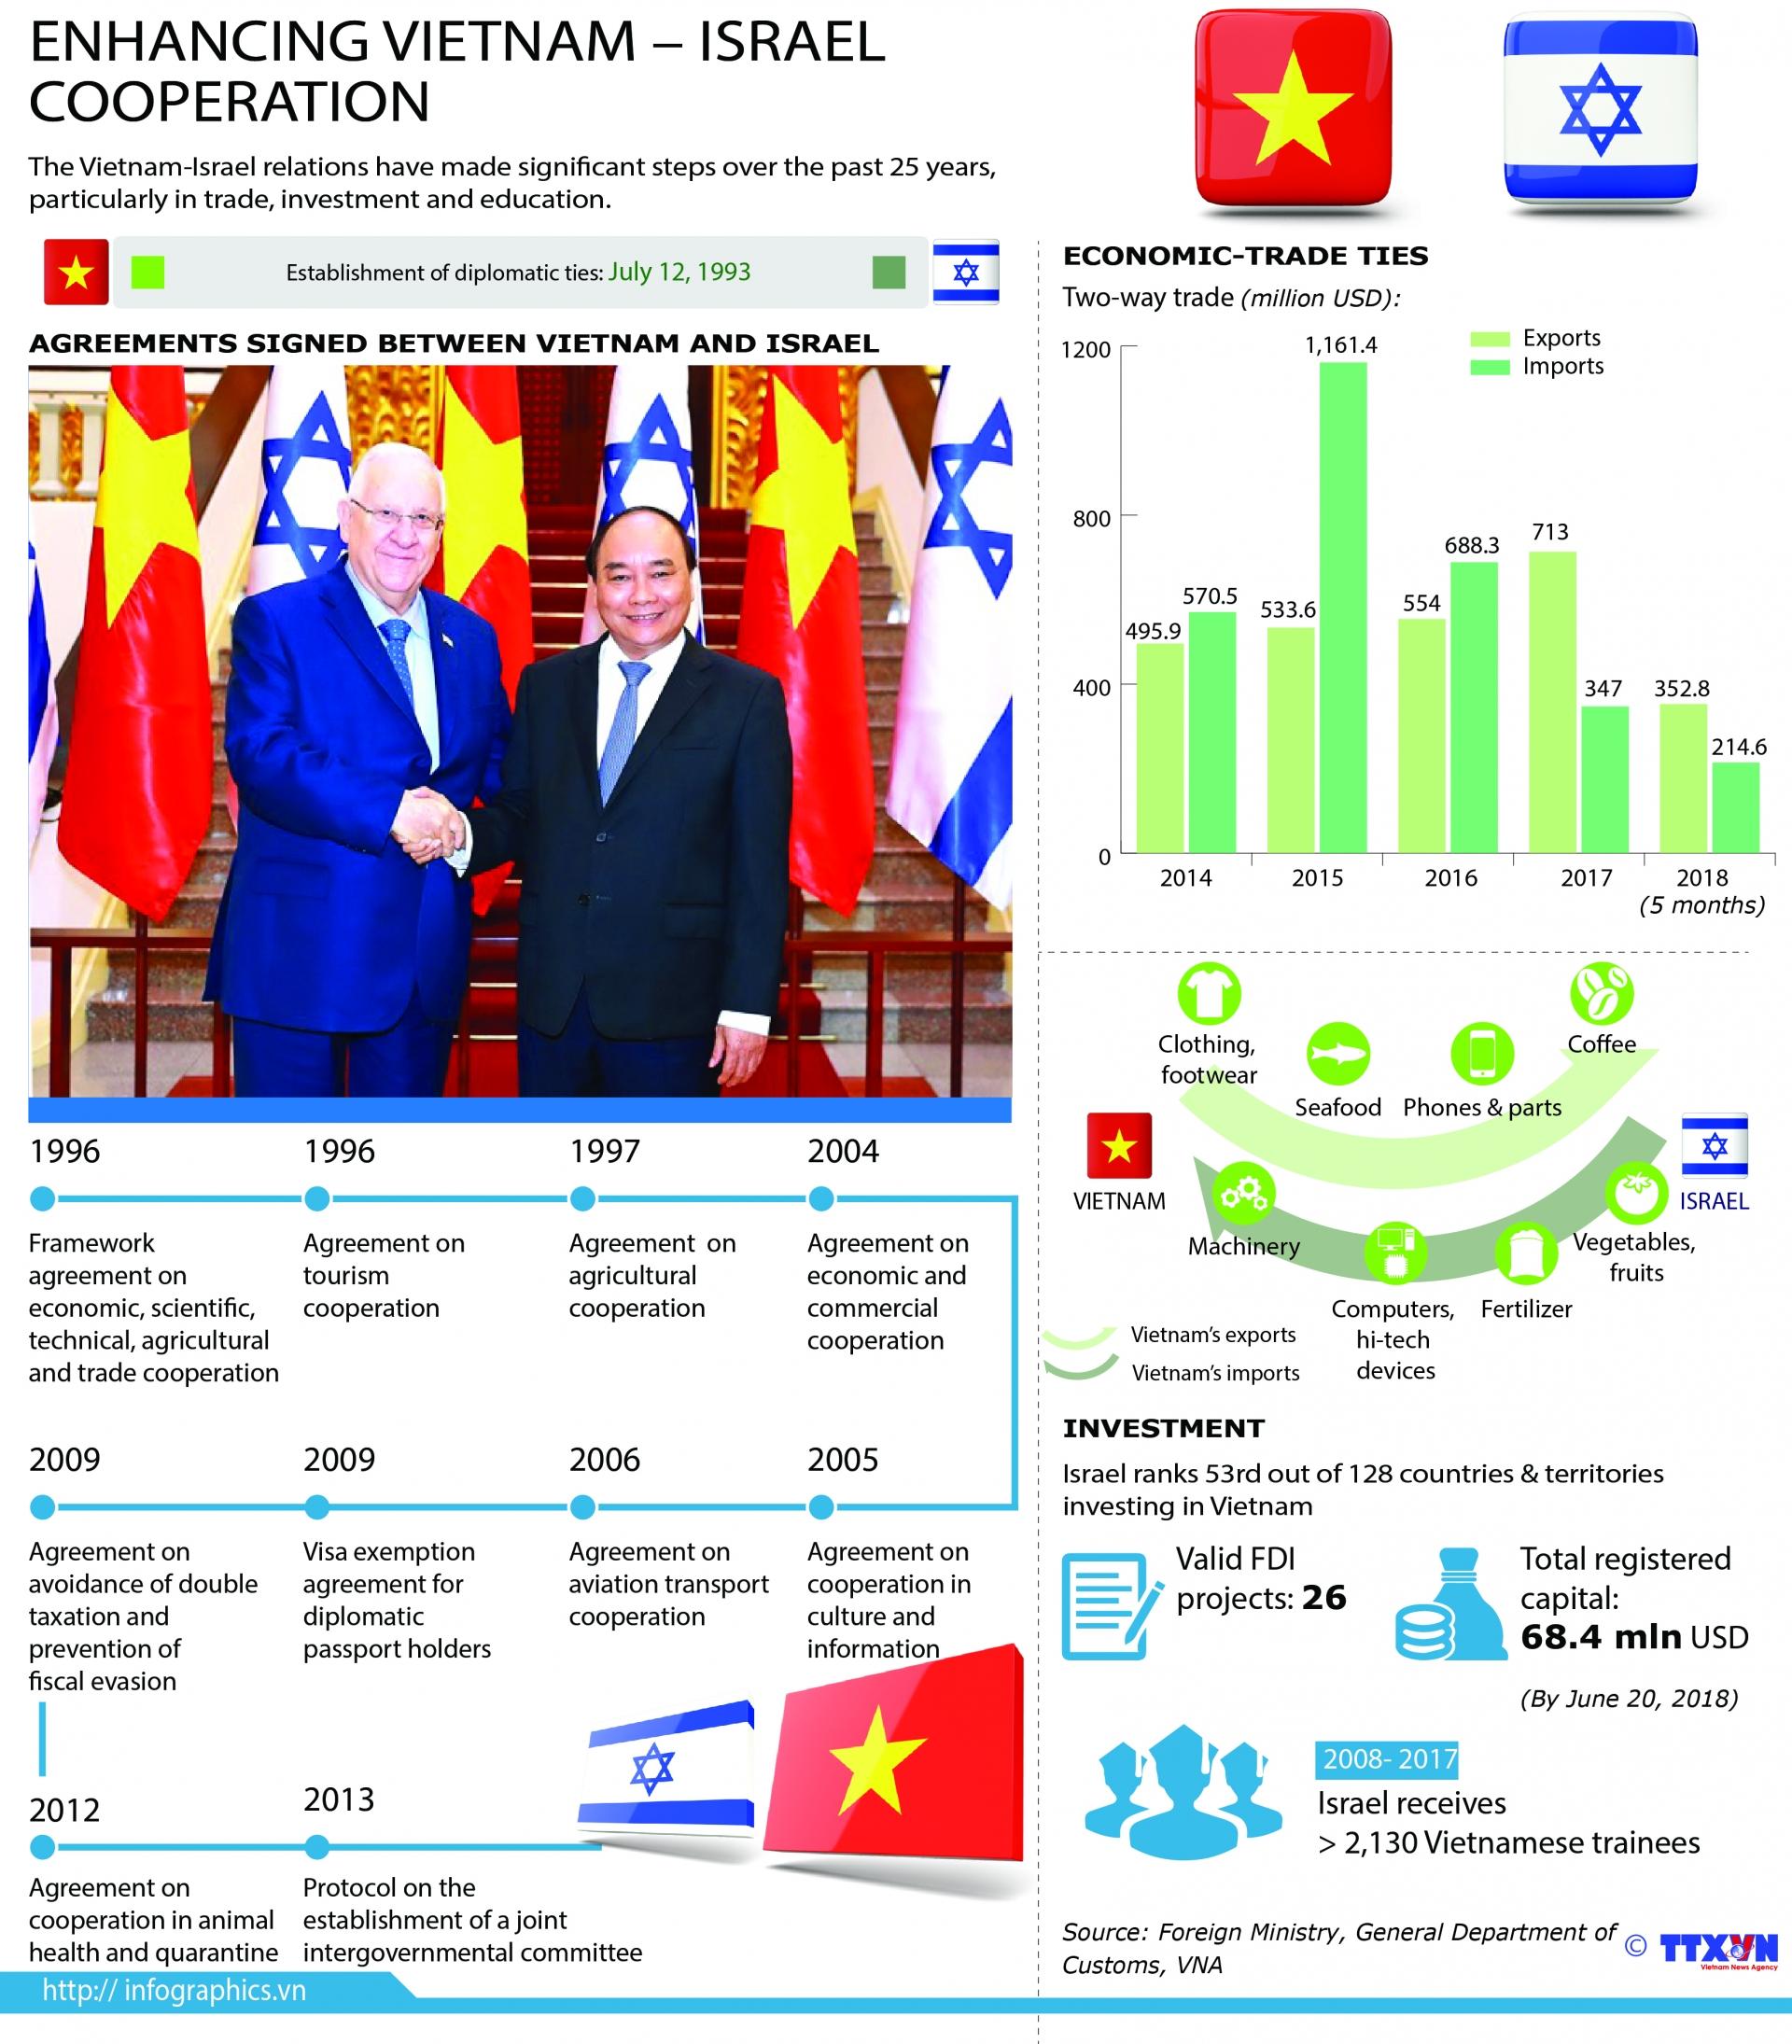 enhancing vietnam israel cooperation